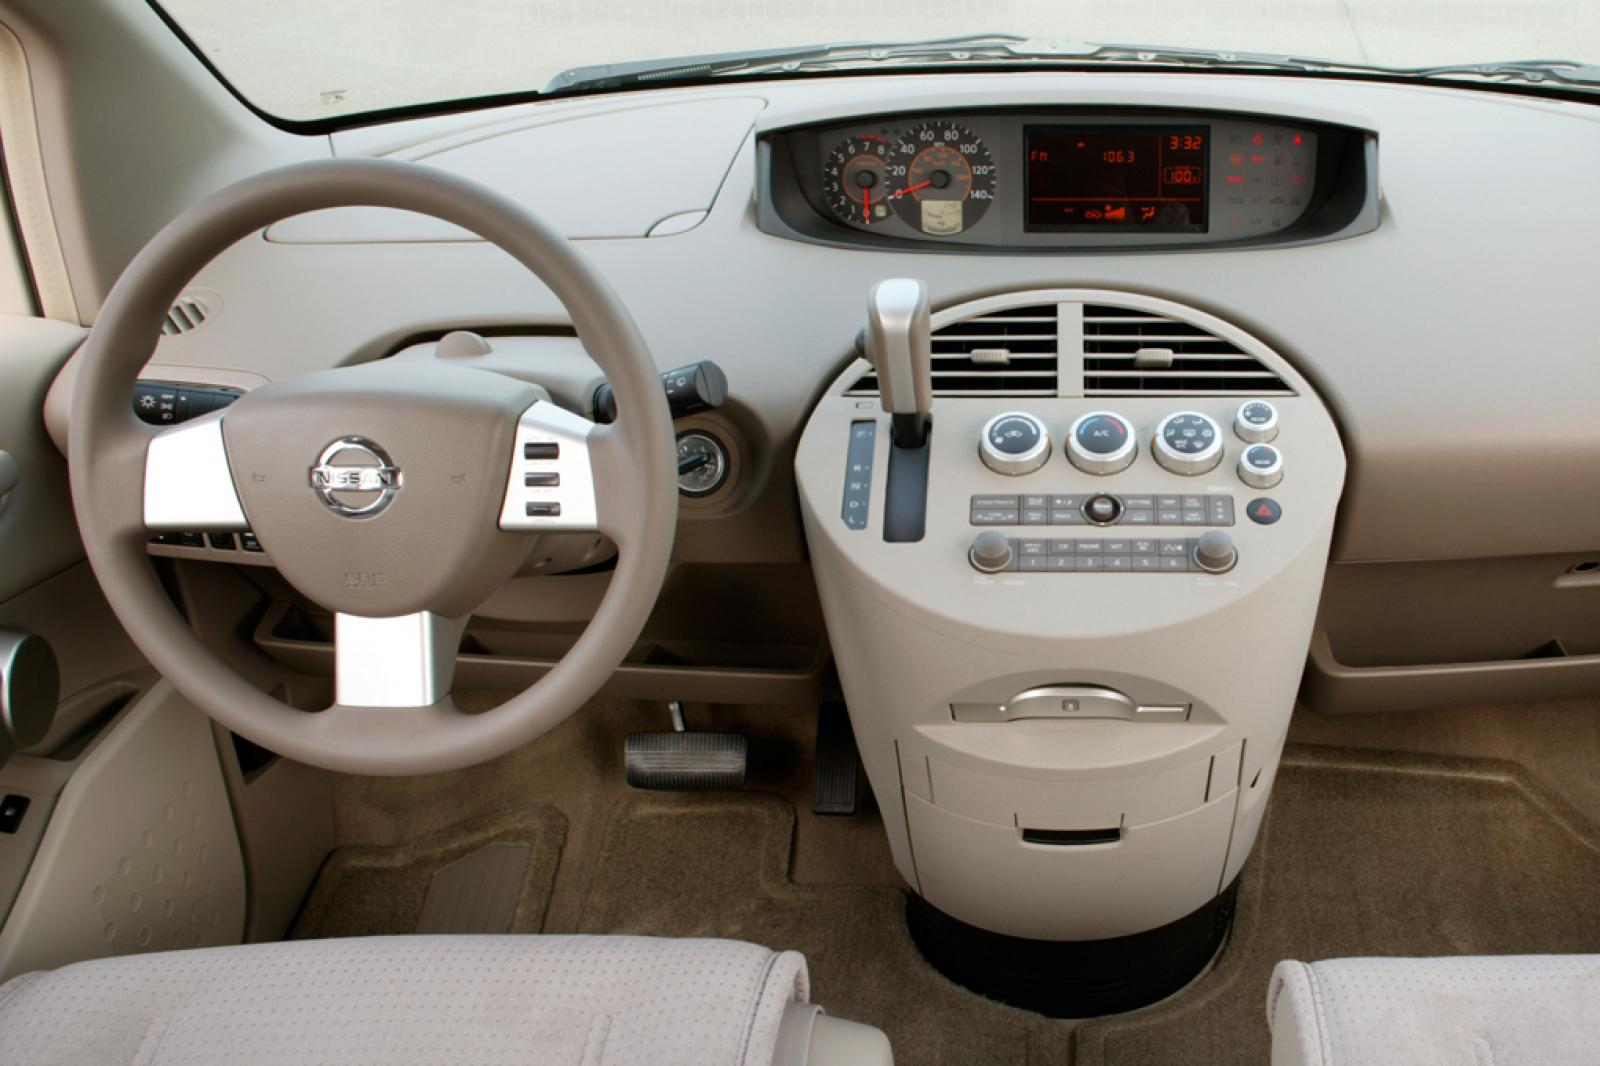 800 1024 1280 1600 Origin 2009 Nissan Quest ...